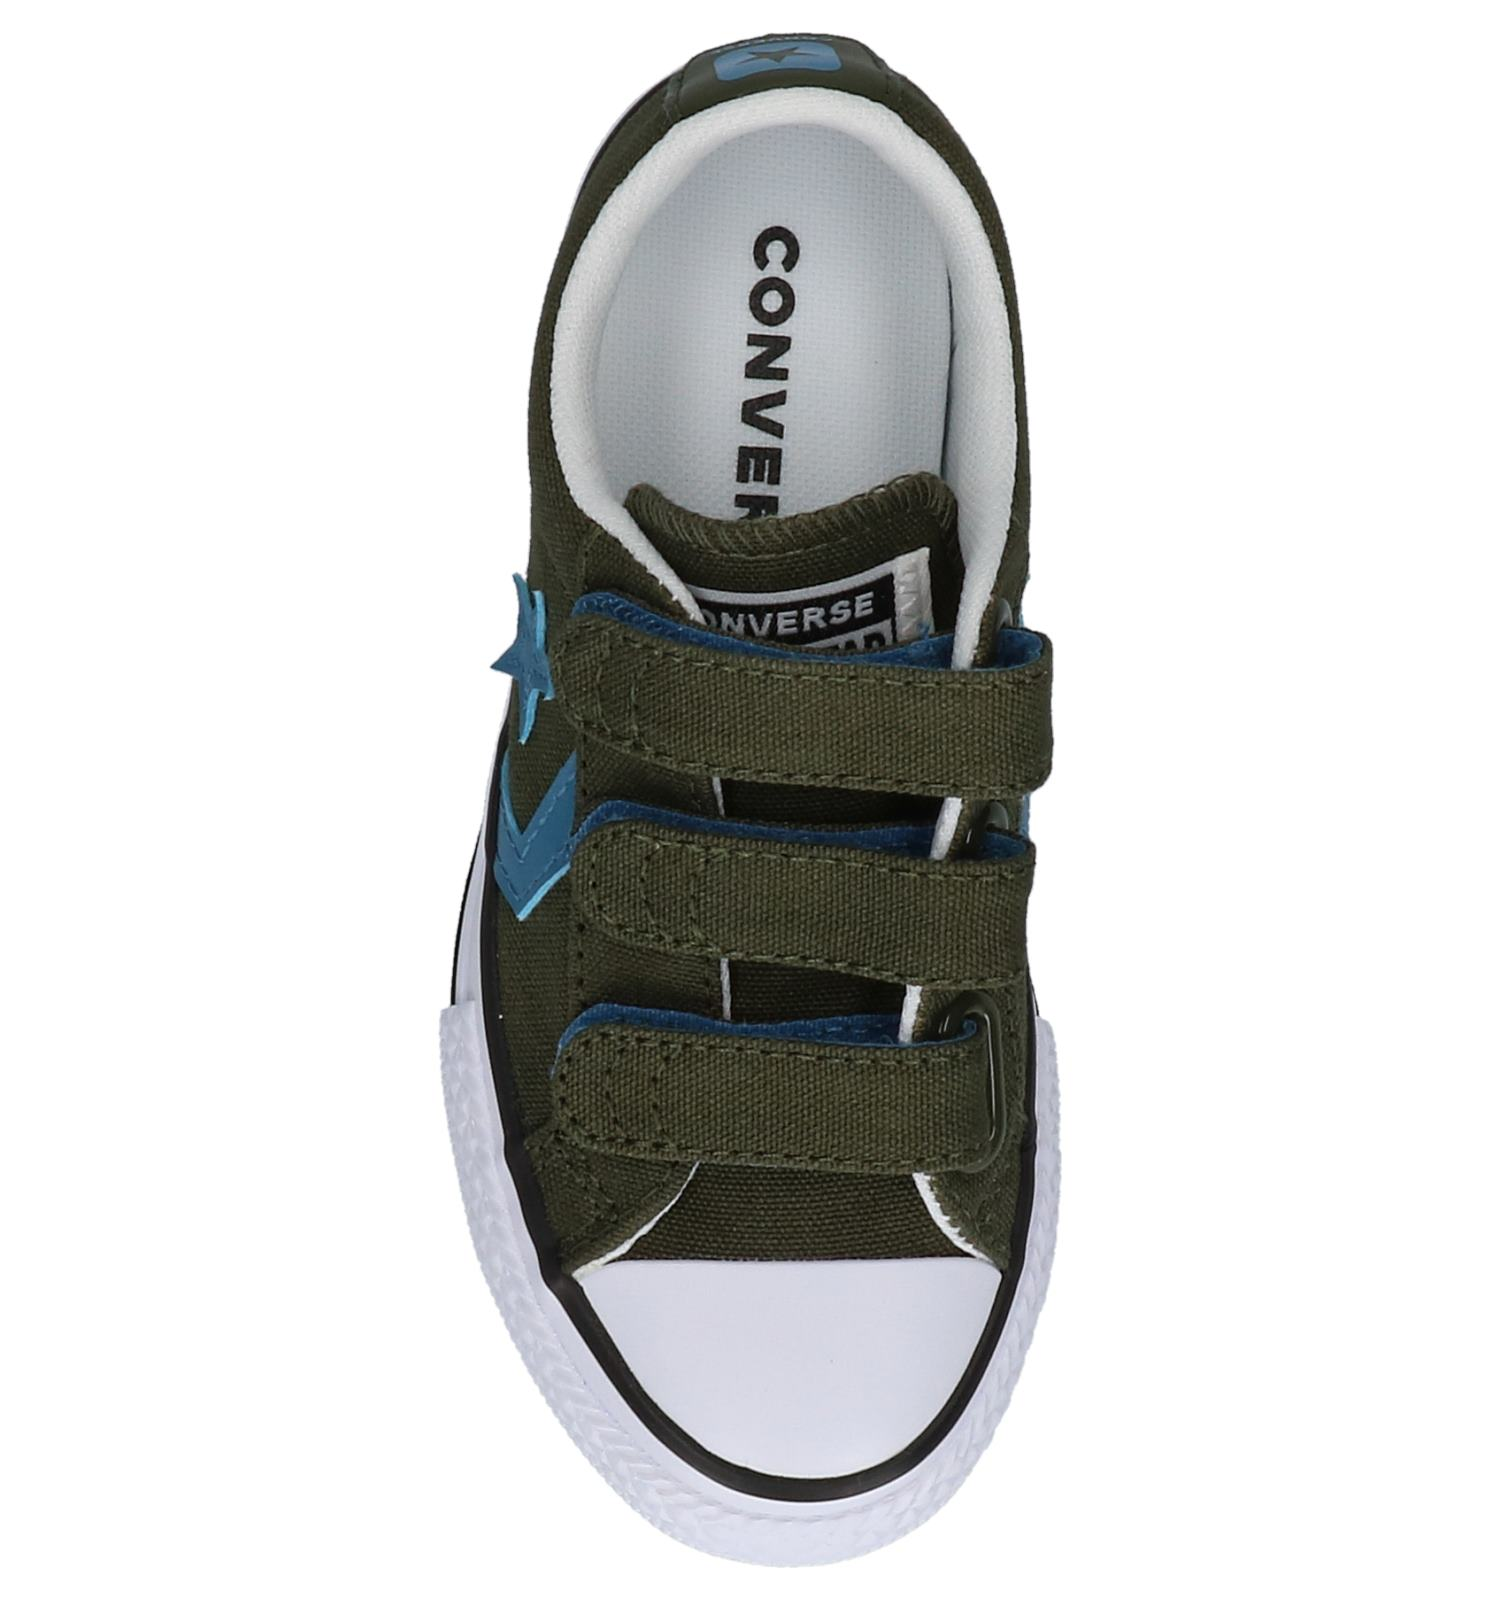 31b5f077ba0 Converse Star Player Kaki Sneakers met Velcro | TORFS.BE | Gratis verzend  en retour